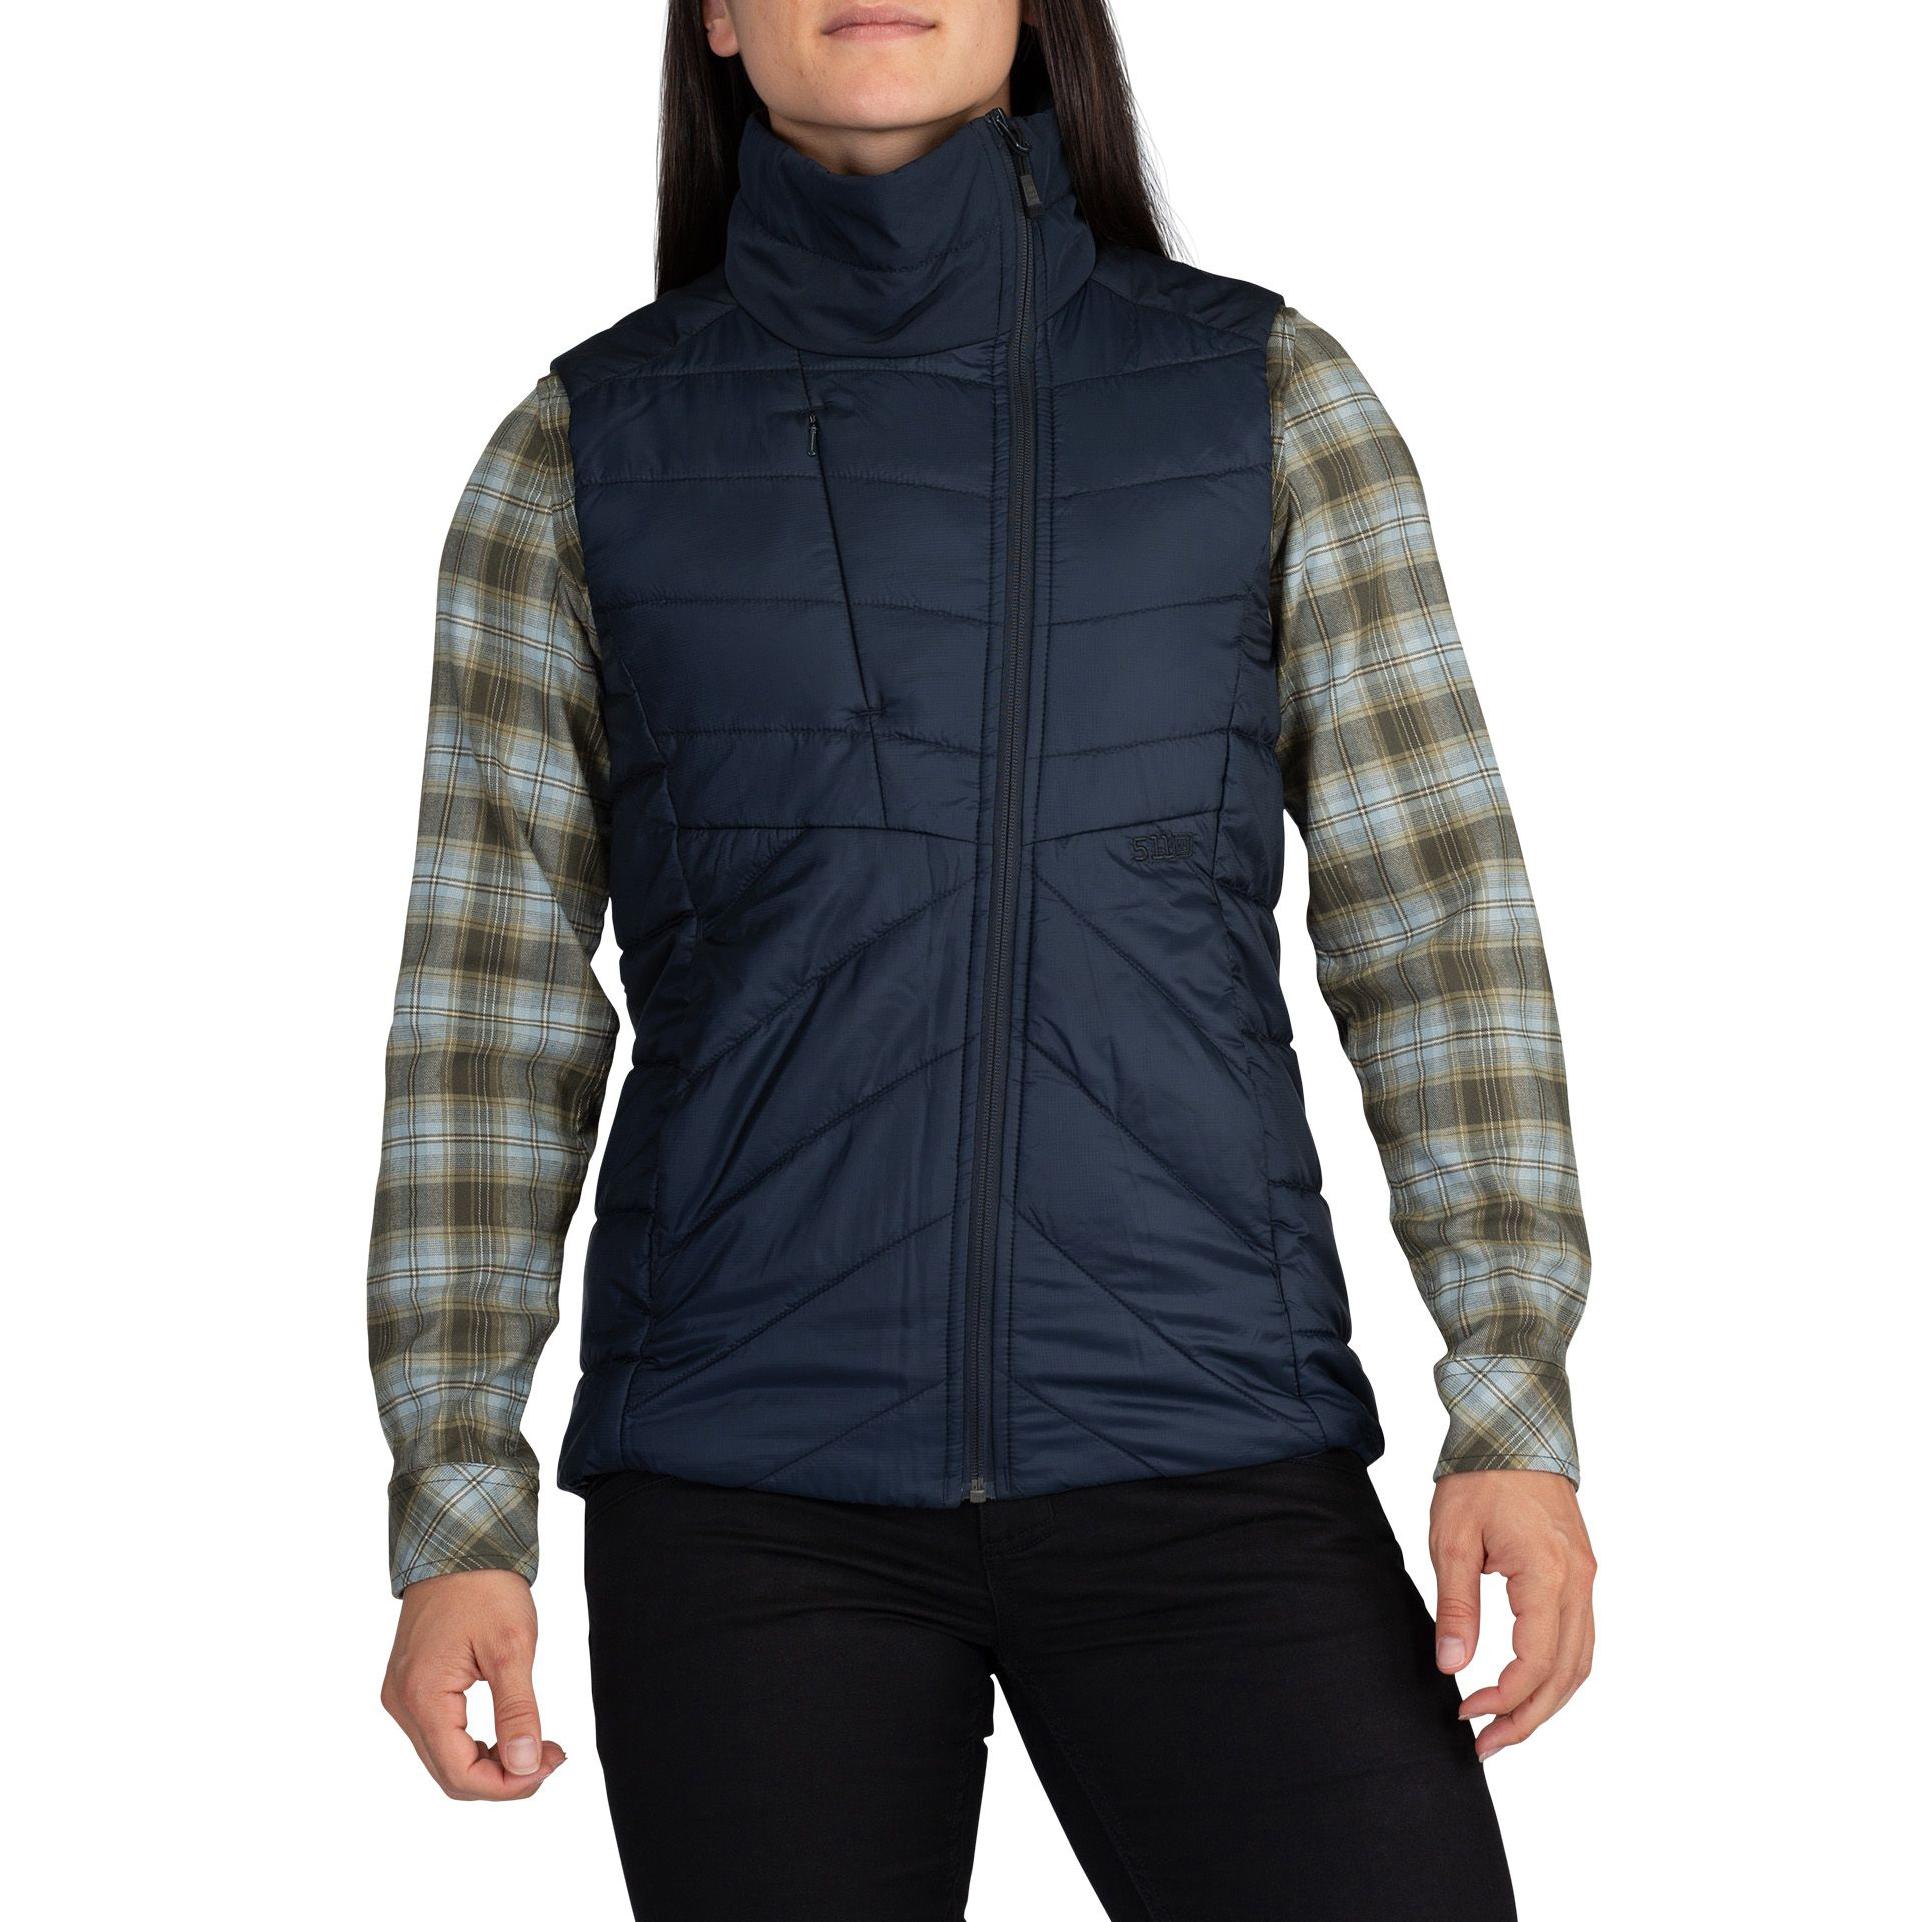 5.11 Women's Peninsula Insulator Vest